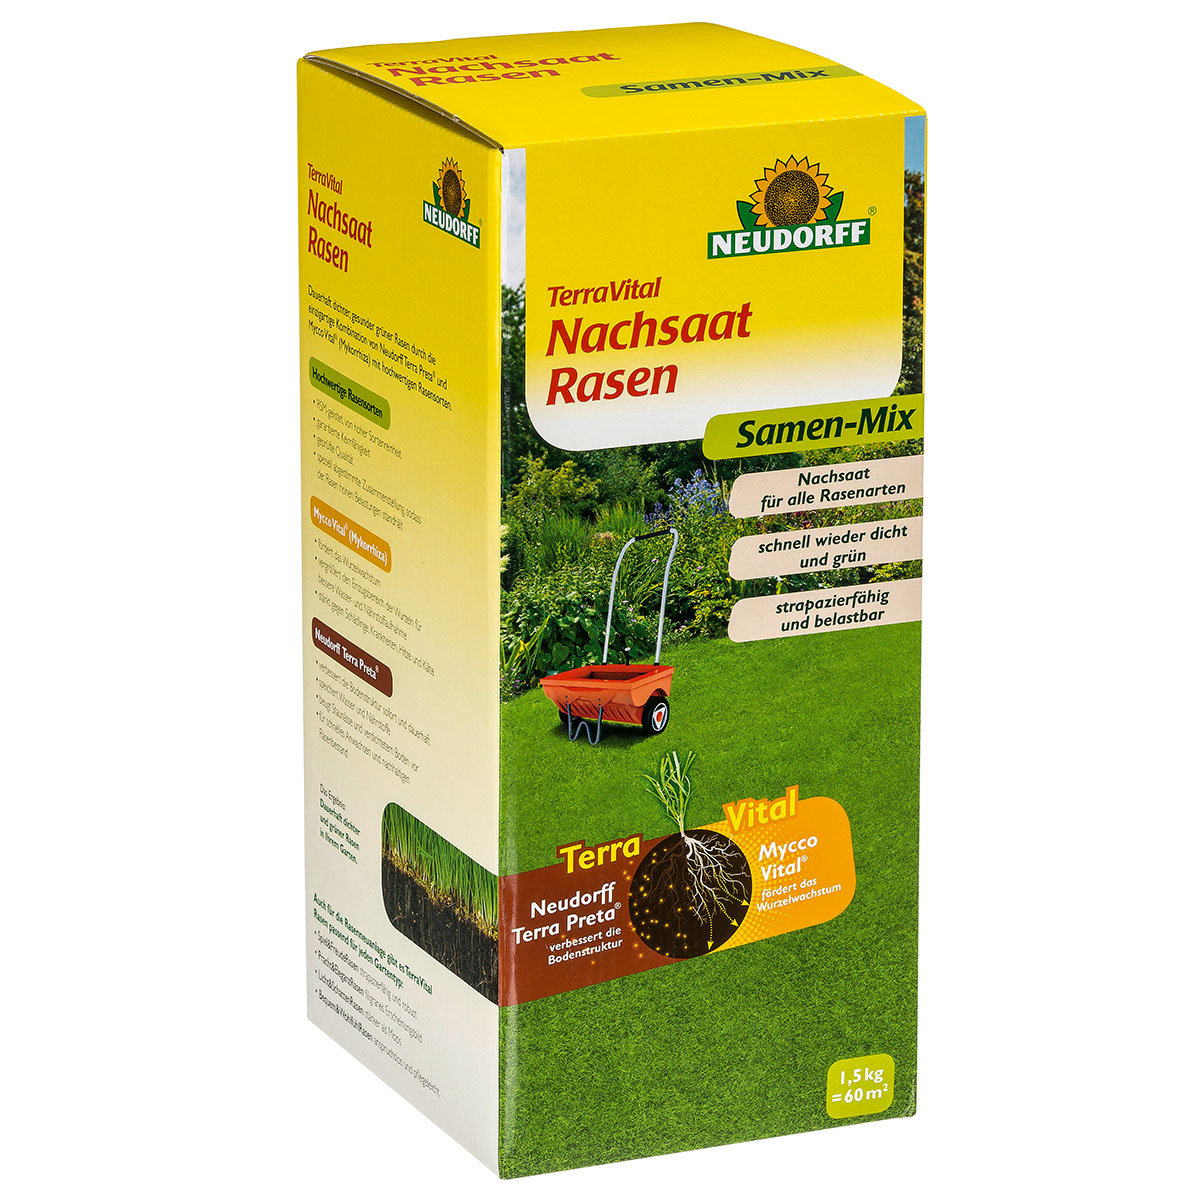 TerraVital® NachsaatRasen, 450 g